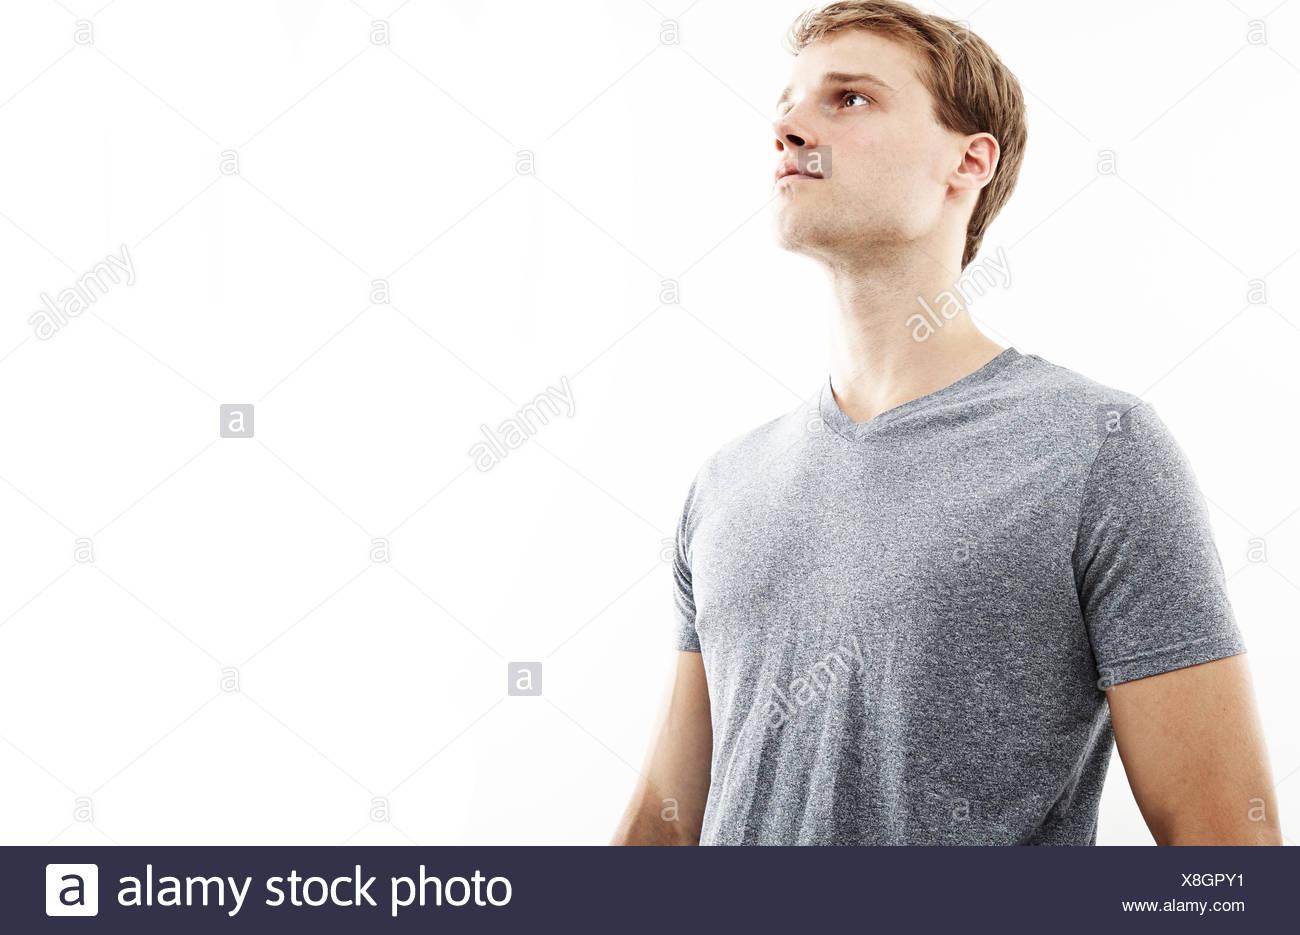 Studio portrait of young man gazing upward - Stock Image